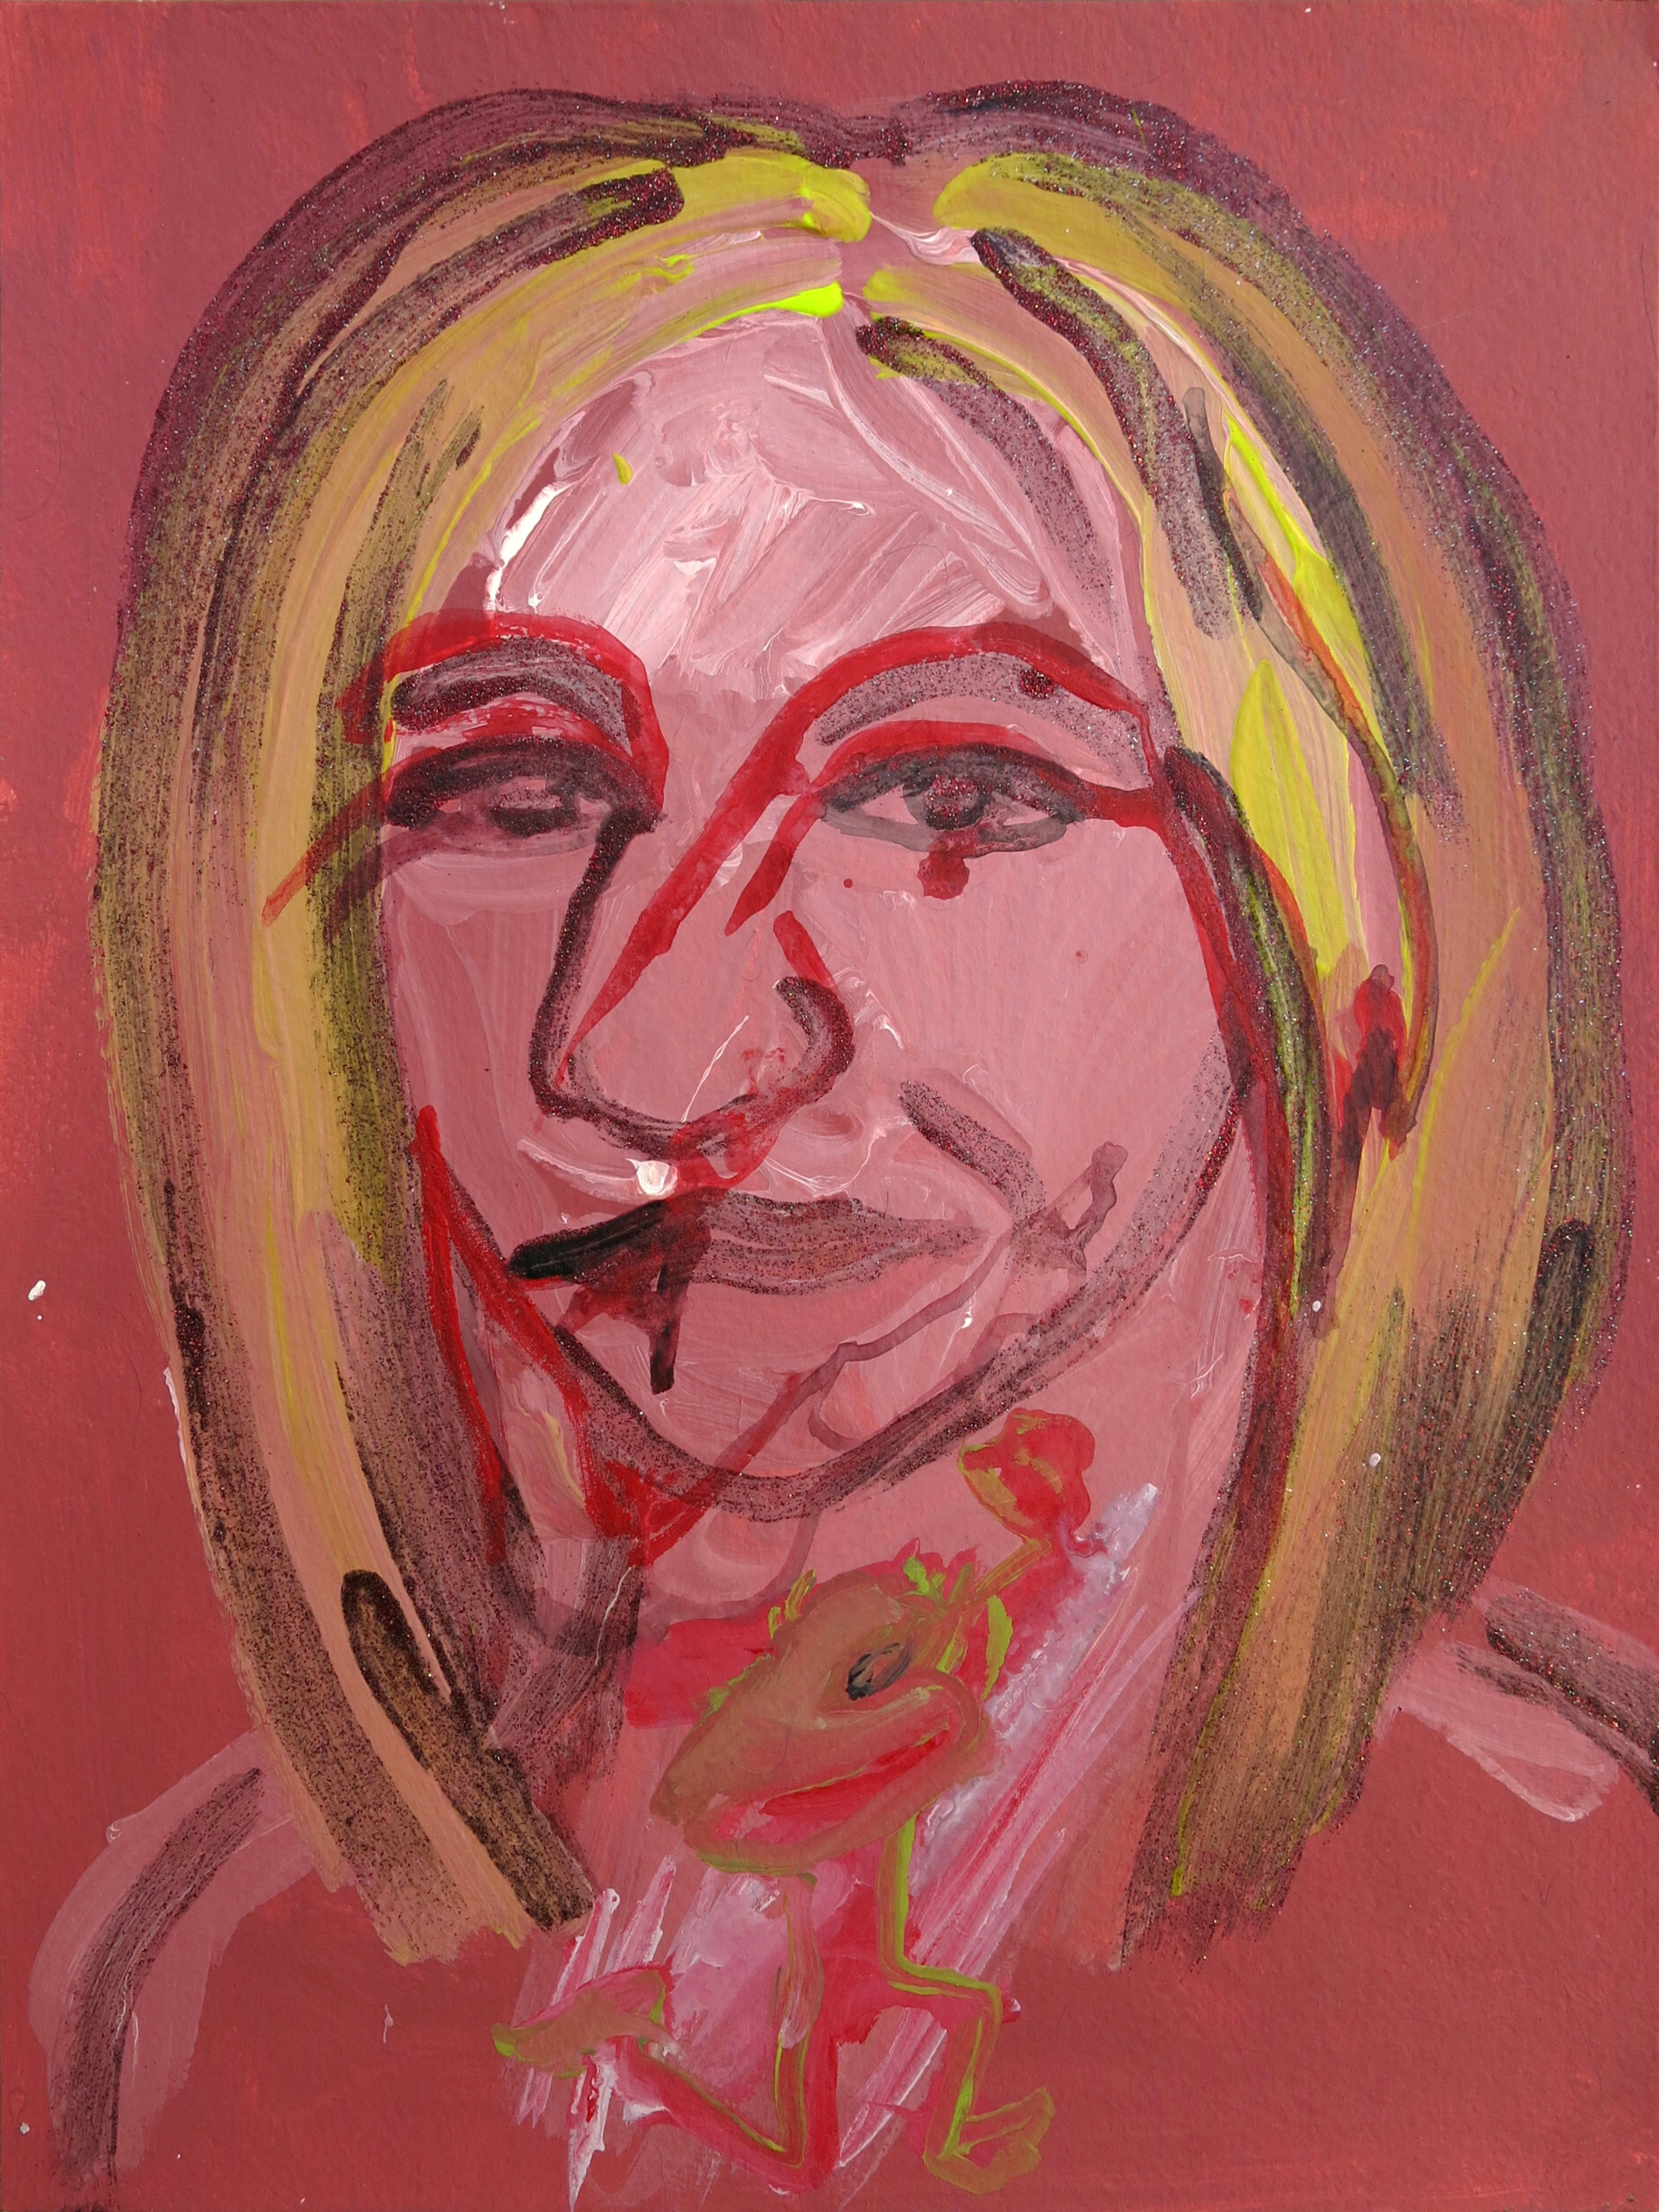 Barbra Streisand Portrait #226